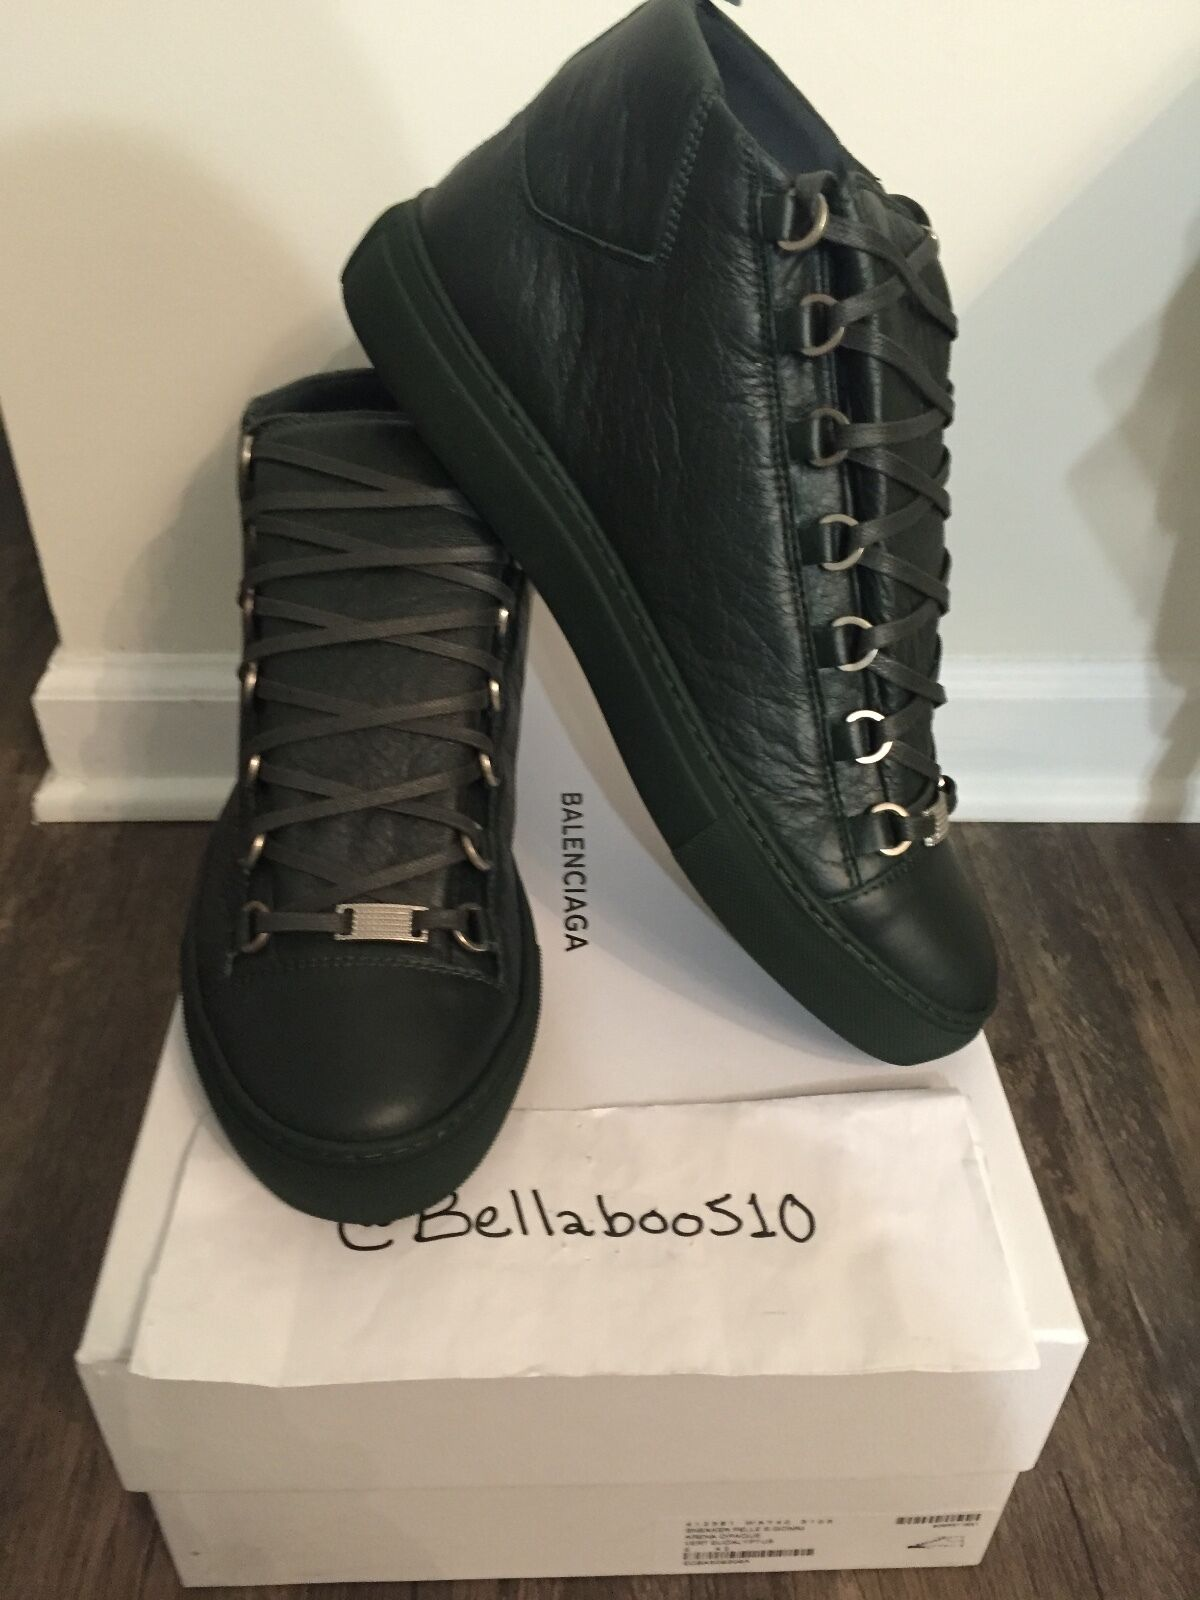 Scarpe casual da uomo  Balenciaga Arena Hightop Sneaker in Dark Green size 42